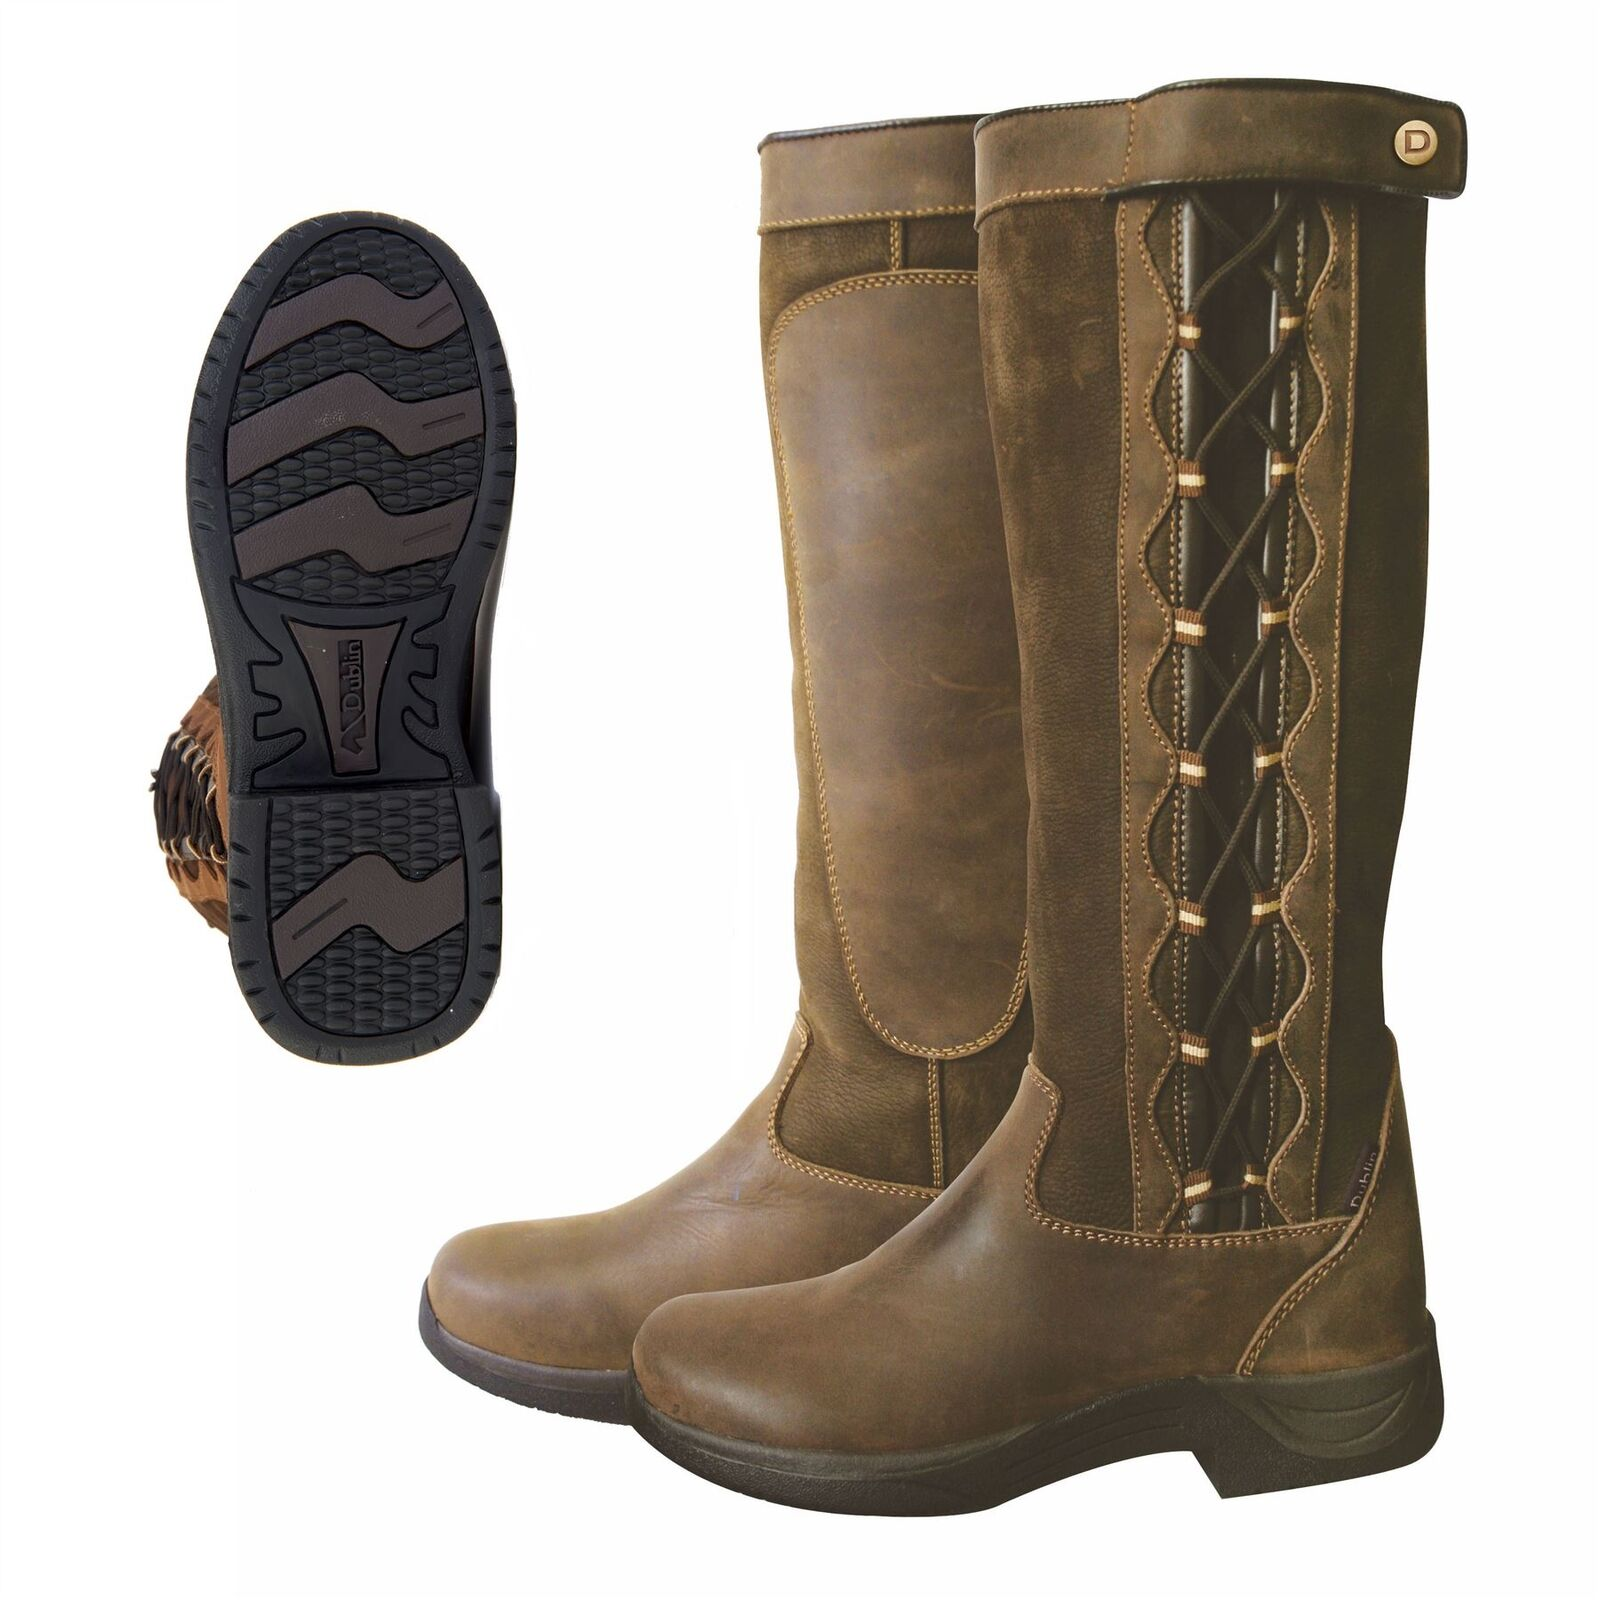 Dublin Pinnacle I Fashionable Country Waterproof Boots